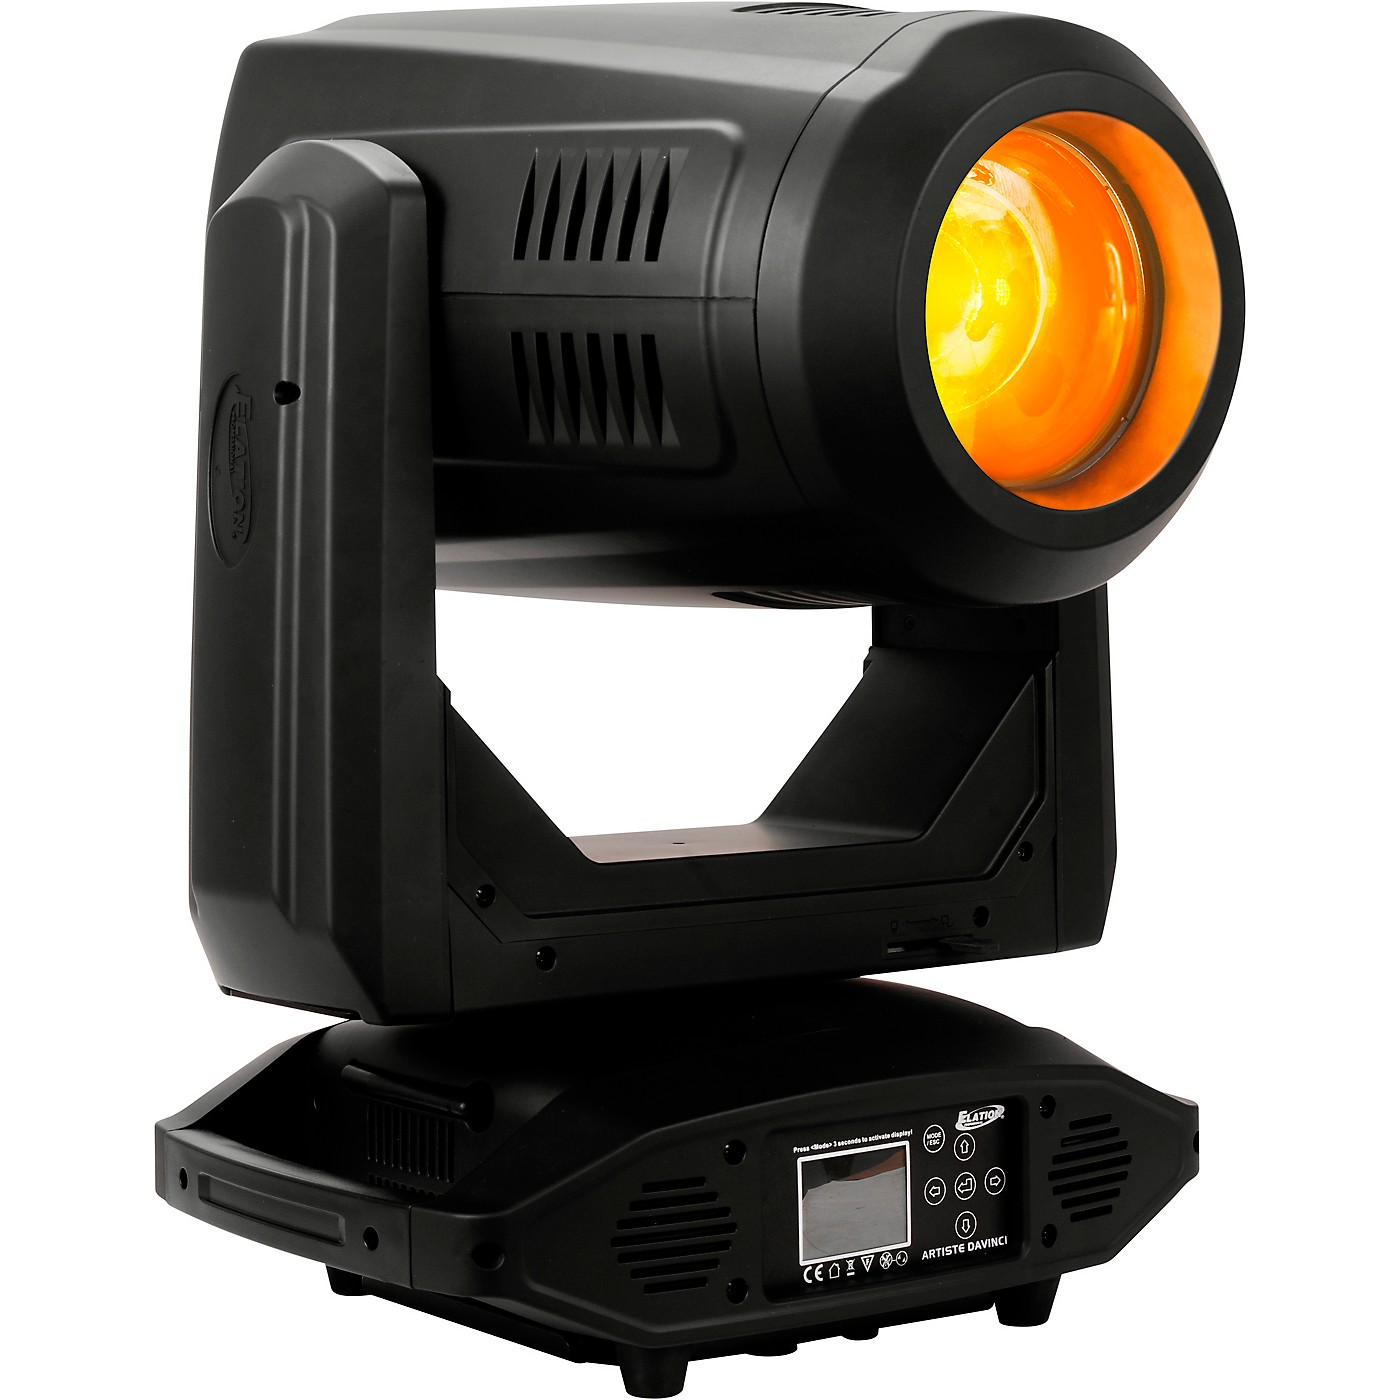 Elation Artiste Davnici 270W Moving Head LED Fixture thumbnail